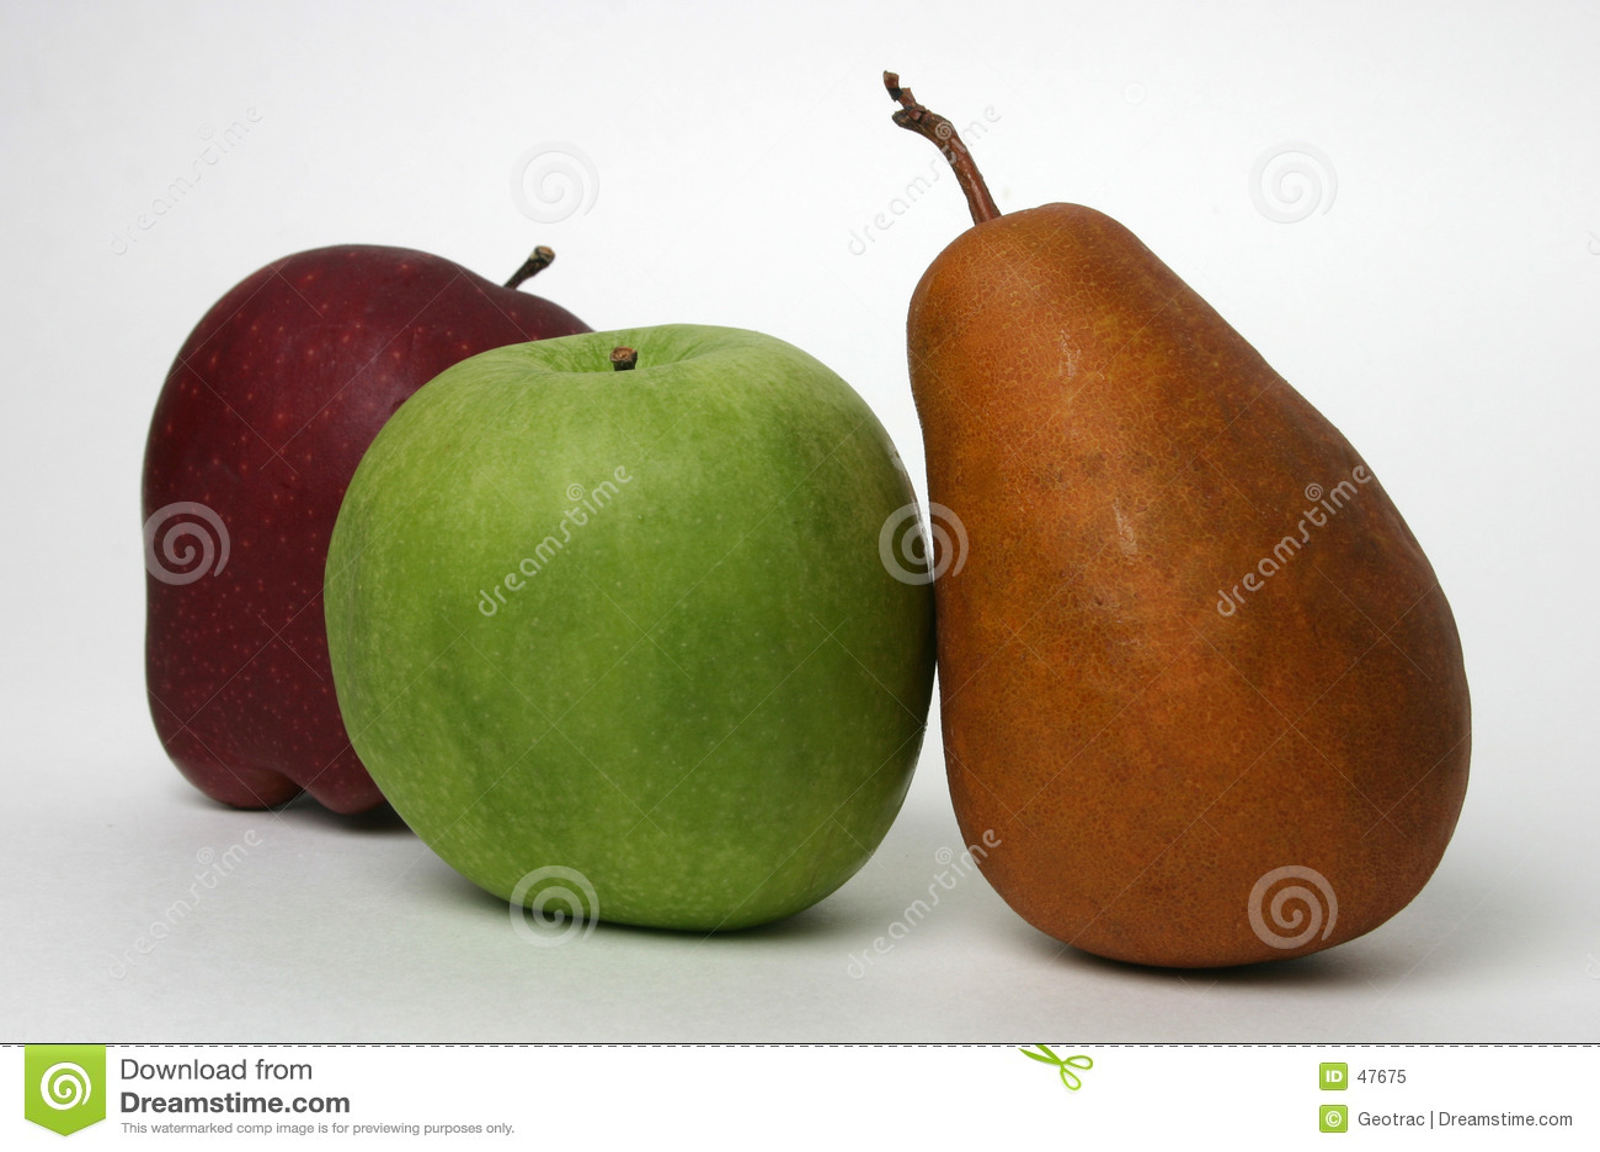 3 Fruits to keep doctor away